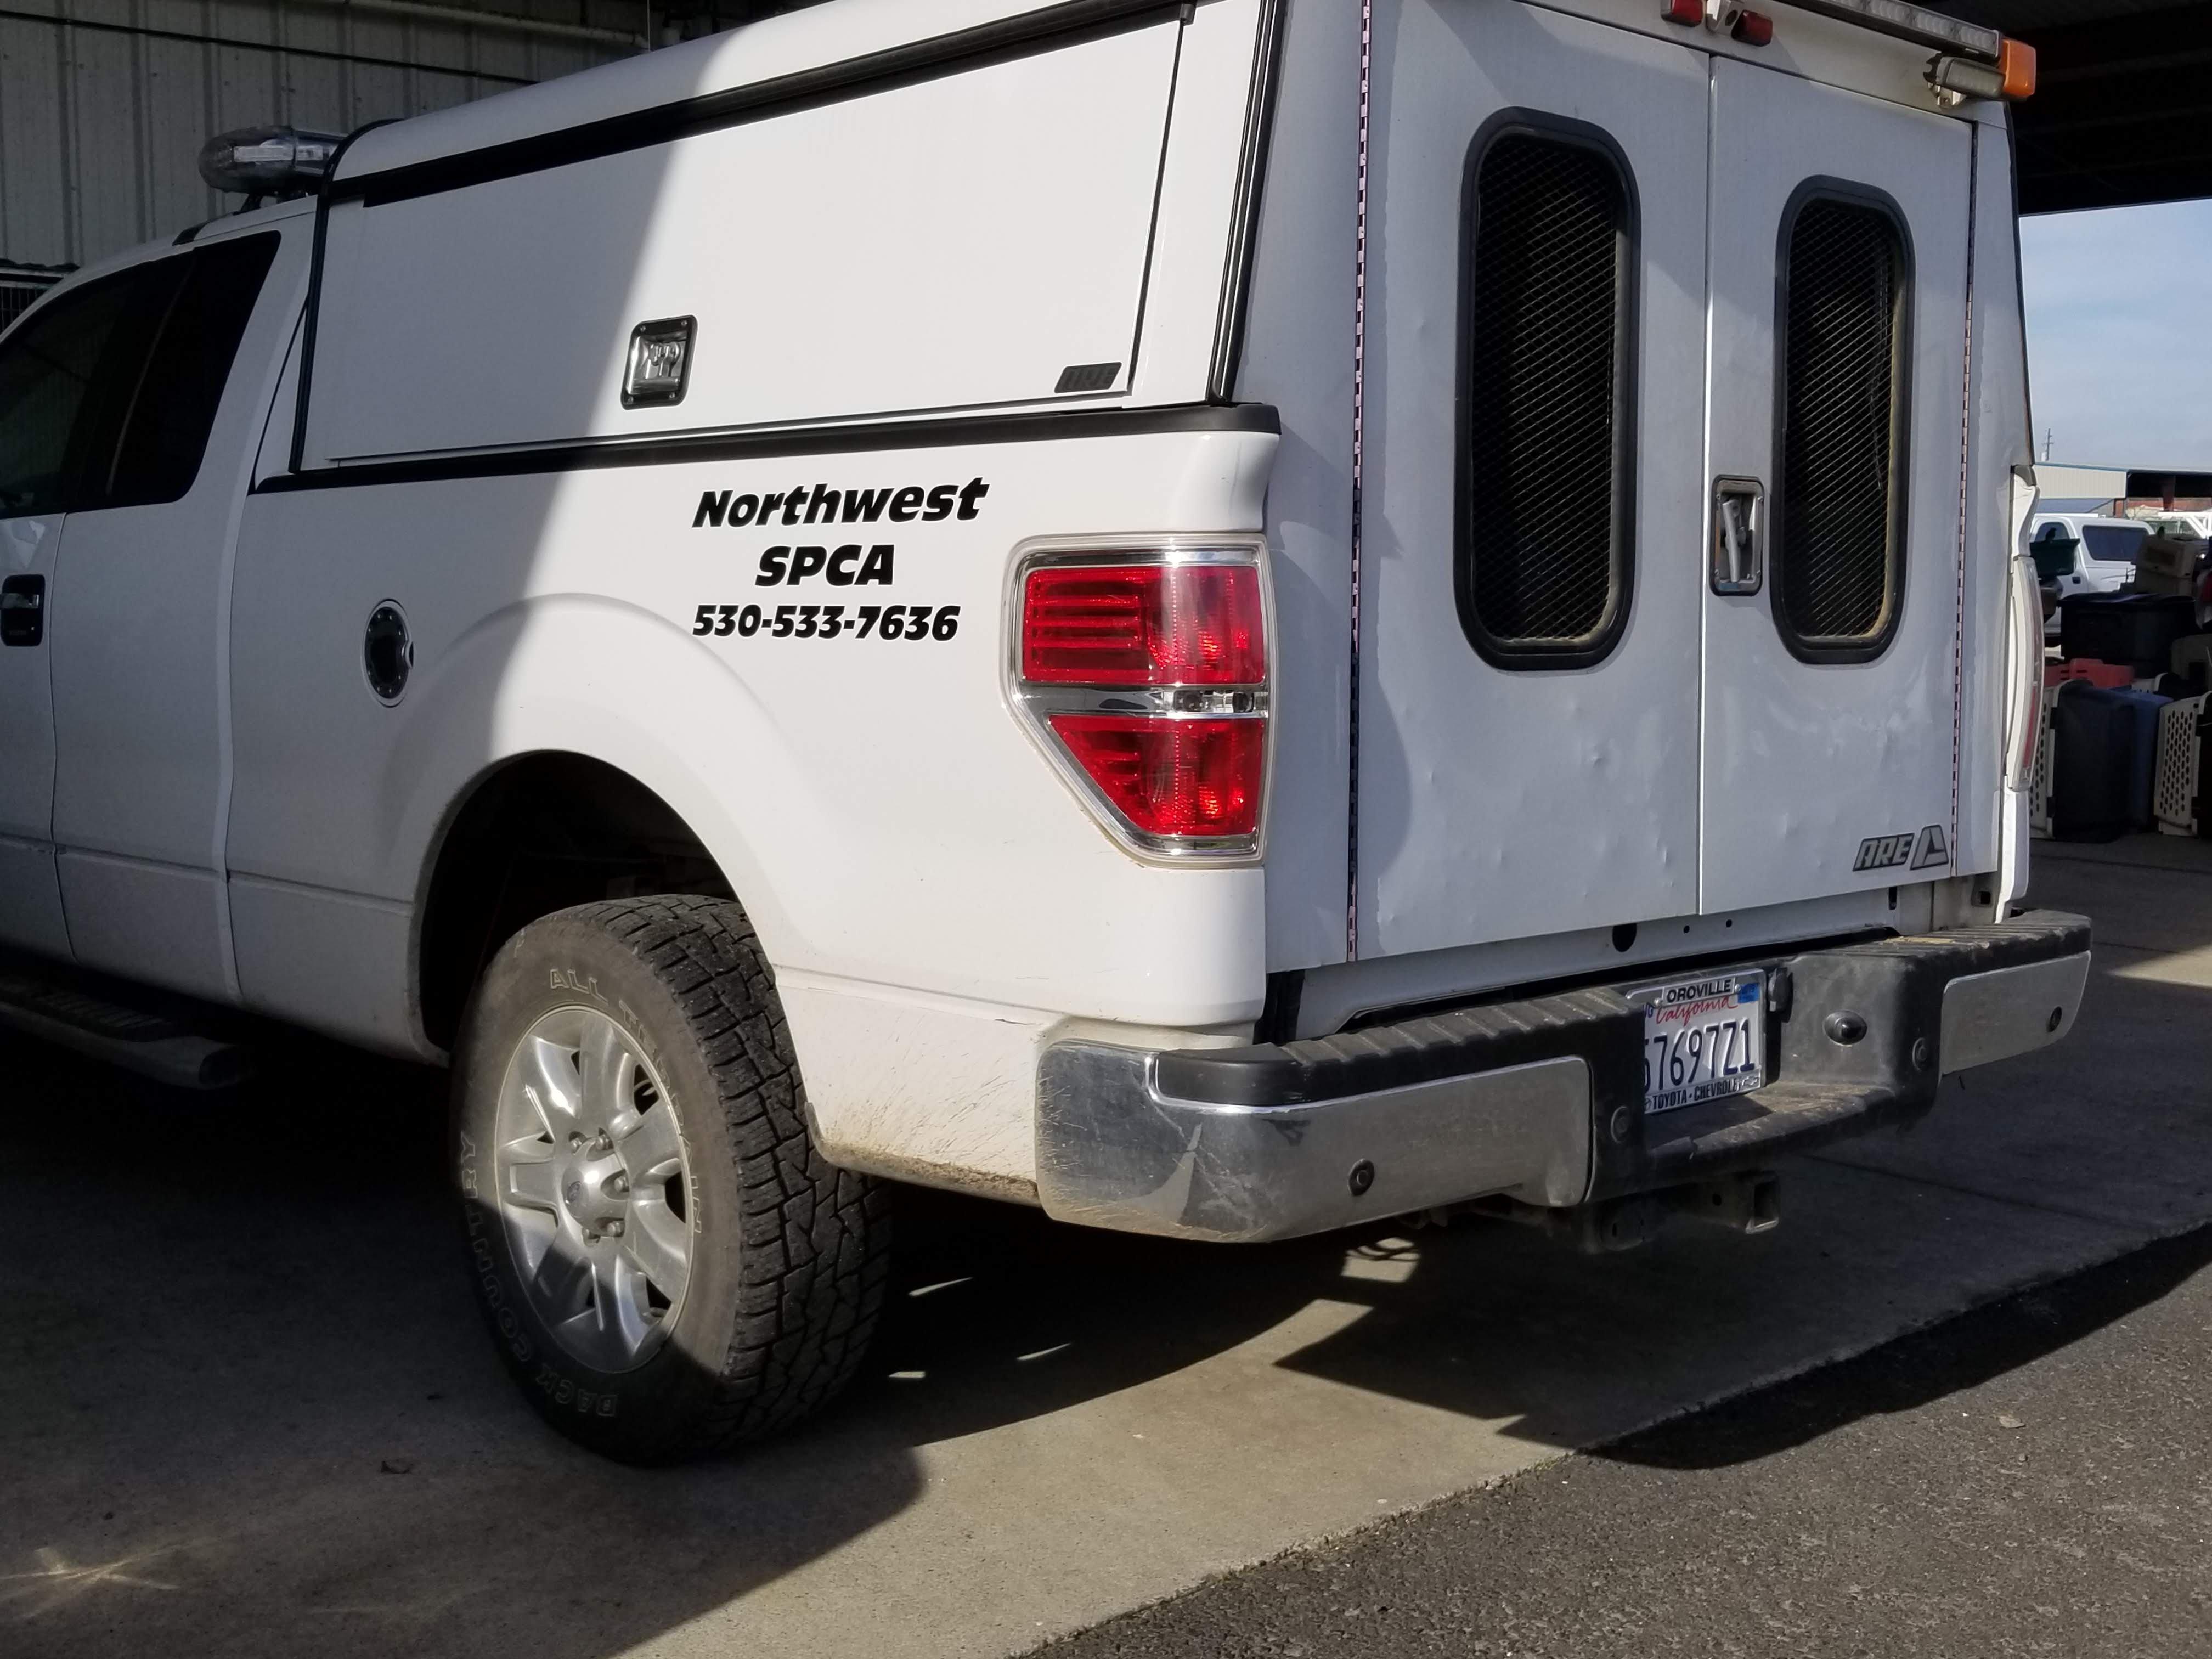 northwest aspca truck